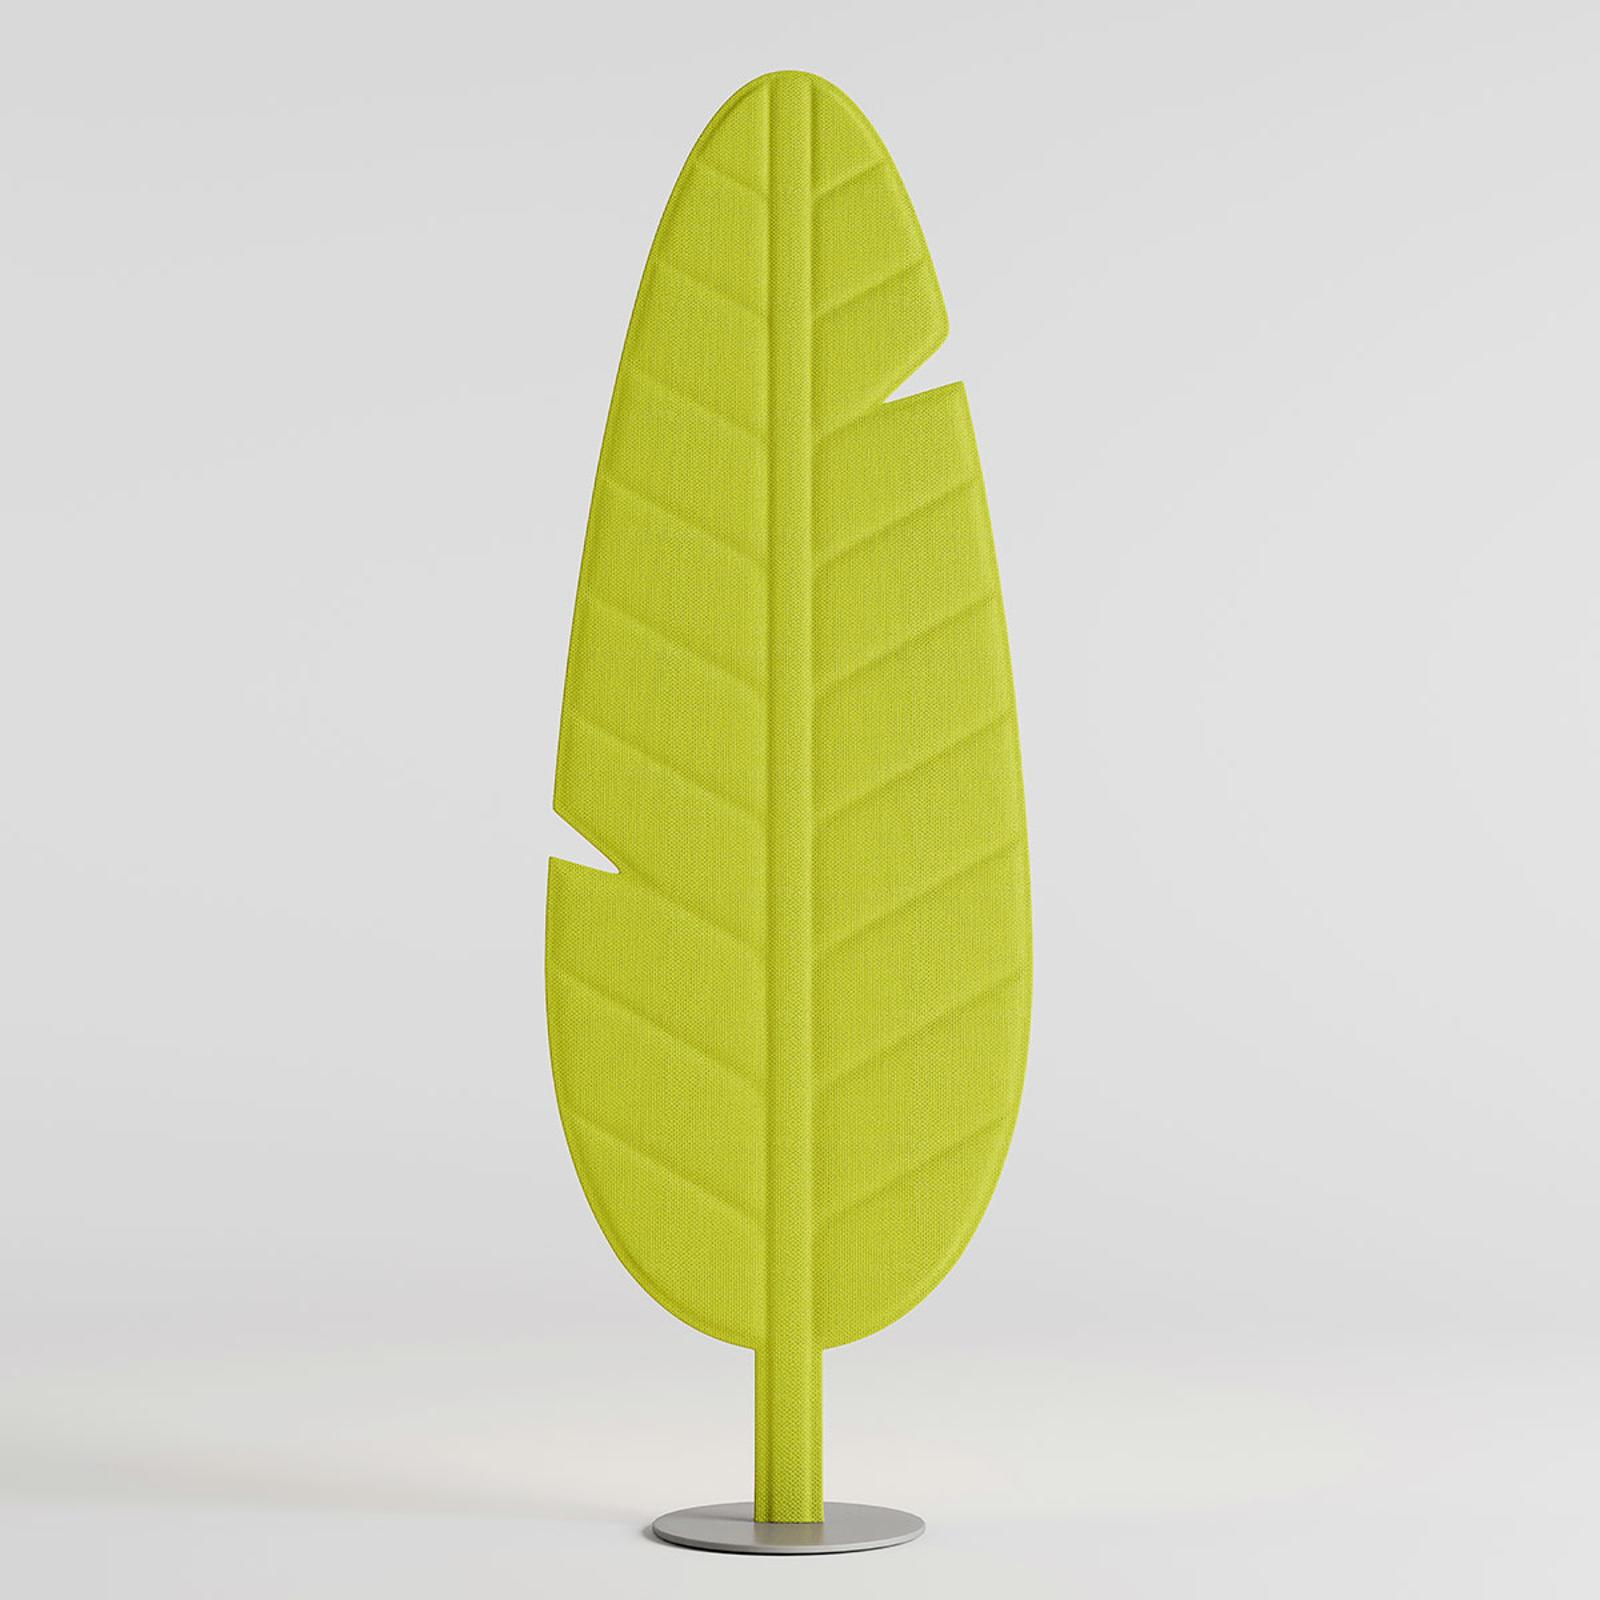 Rotaliana Eden Banana LED-Stehleuchte, hellgrün